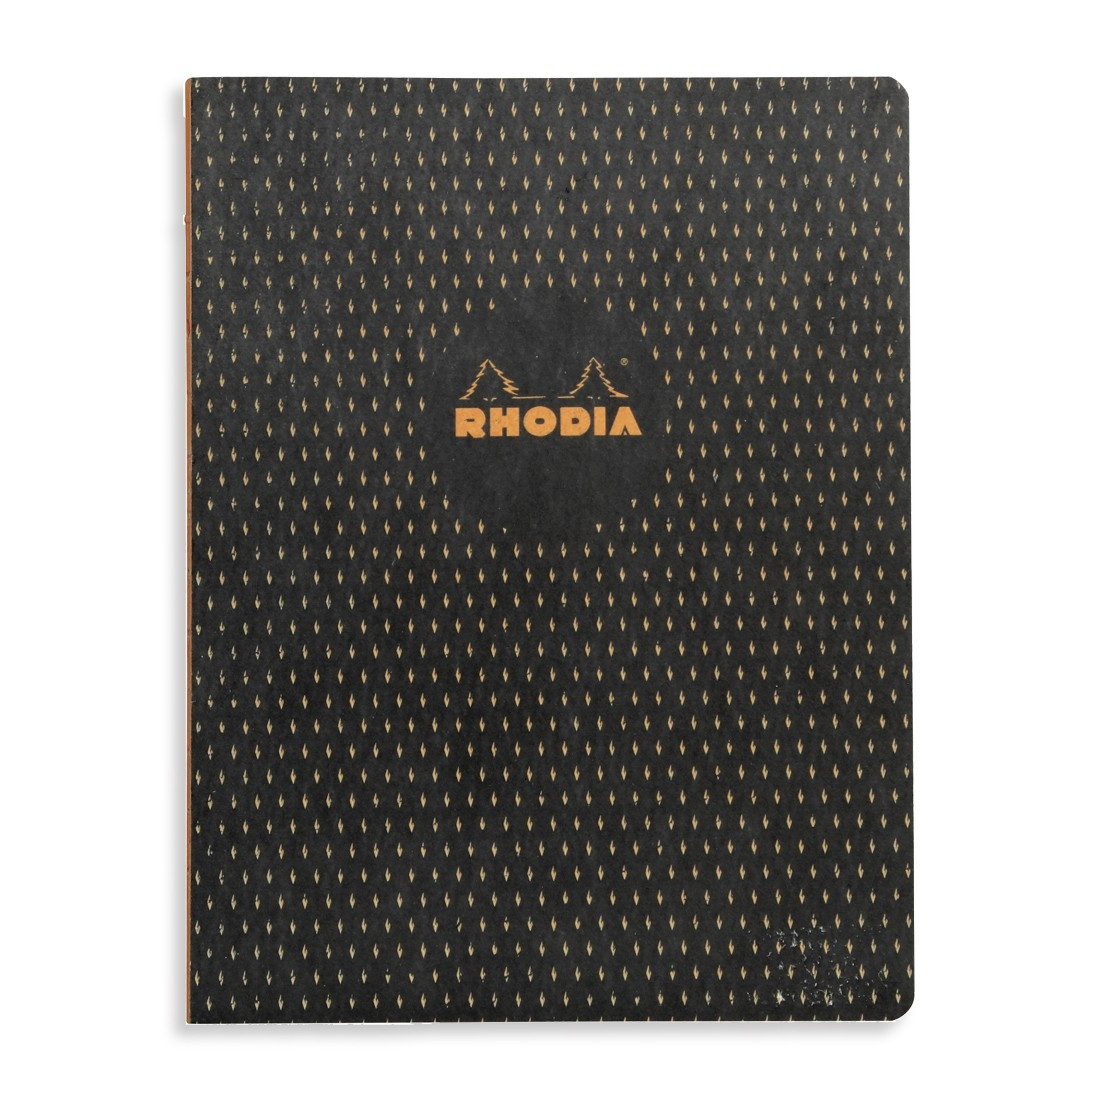 Rhodia Heritage Notebook - Black Moucheture